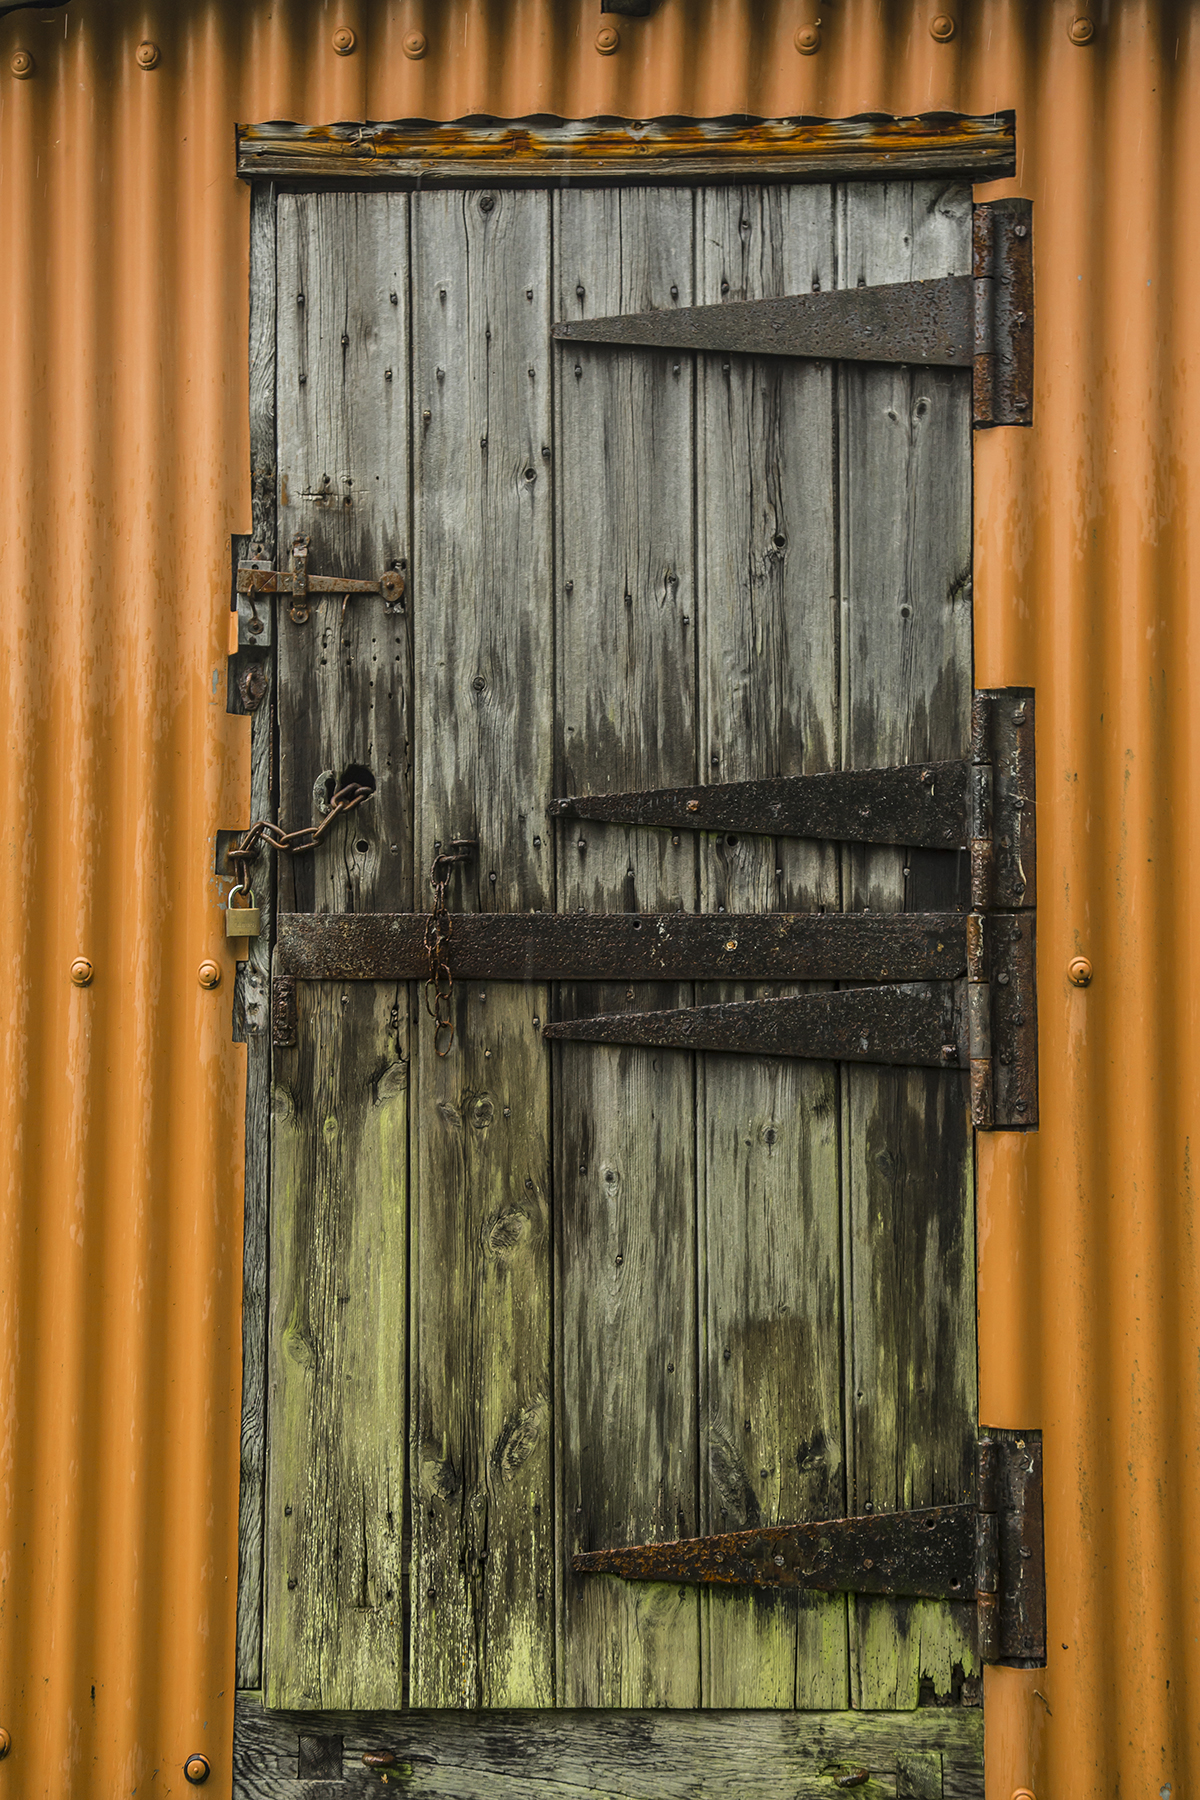 WealdDownland_RG135.jpg